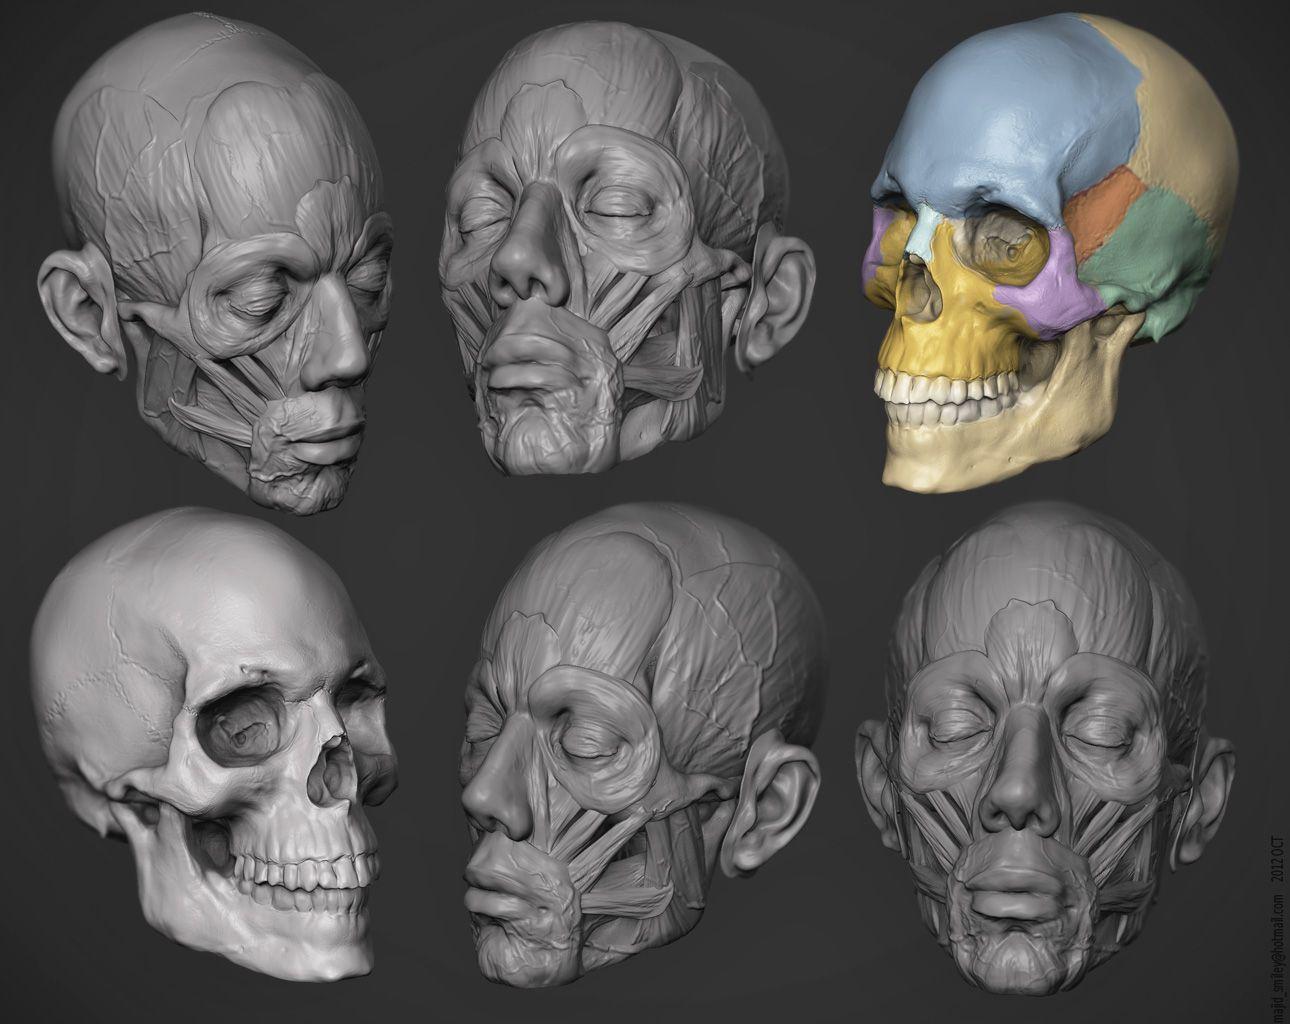 My Zbrush Artworks - Majid Esmaeili - Page 7 | Anatomy | Pinterest ...